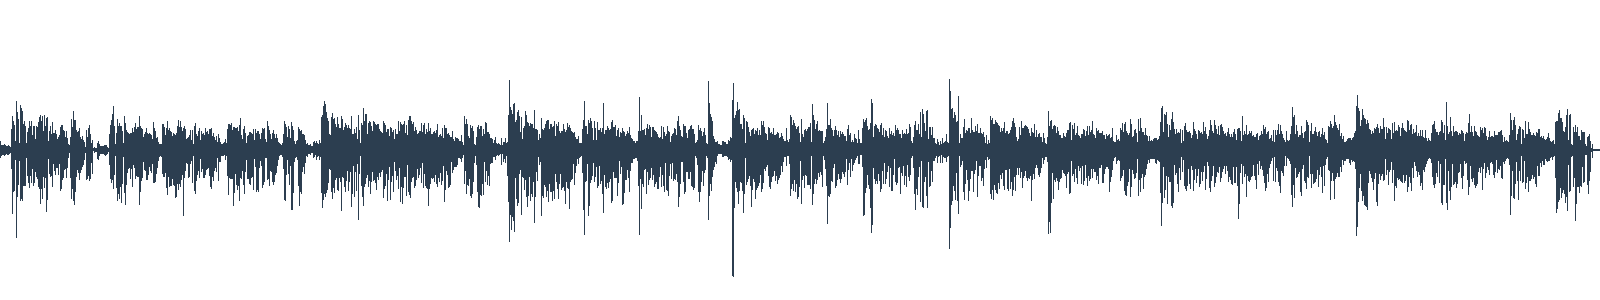 Nové audioknihy 29-30/2019 waveform